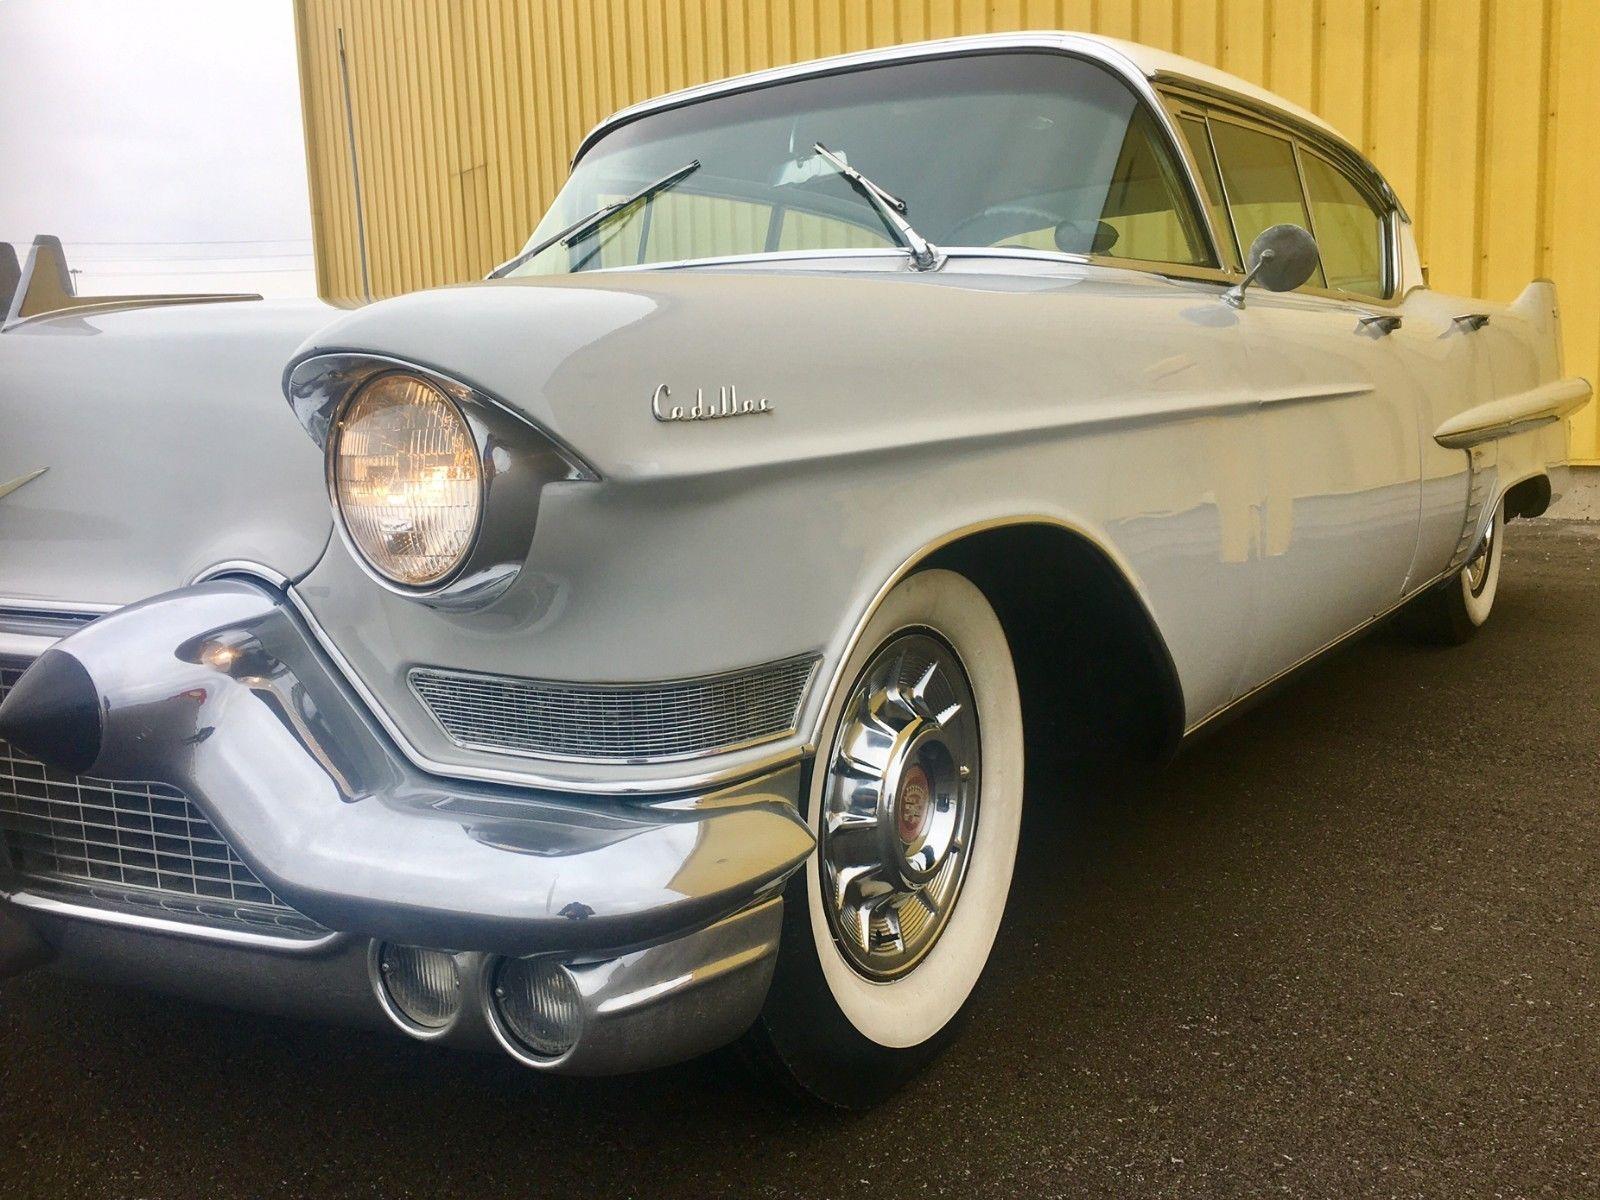 Cadillac DeVille Series 62 sedan